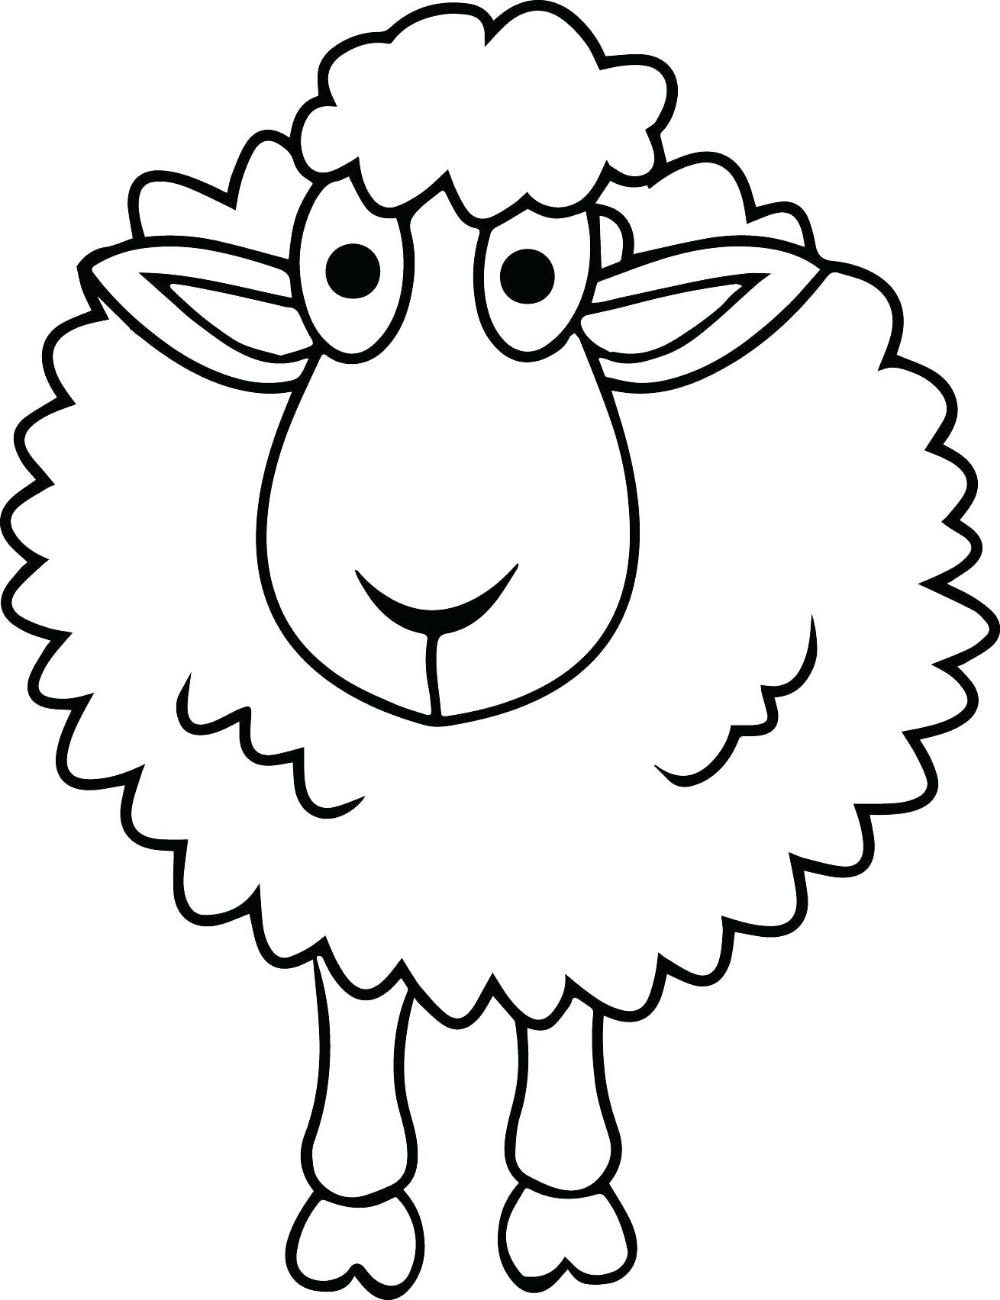 Dibujo de ovejita